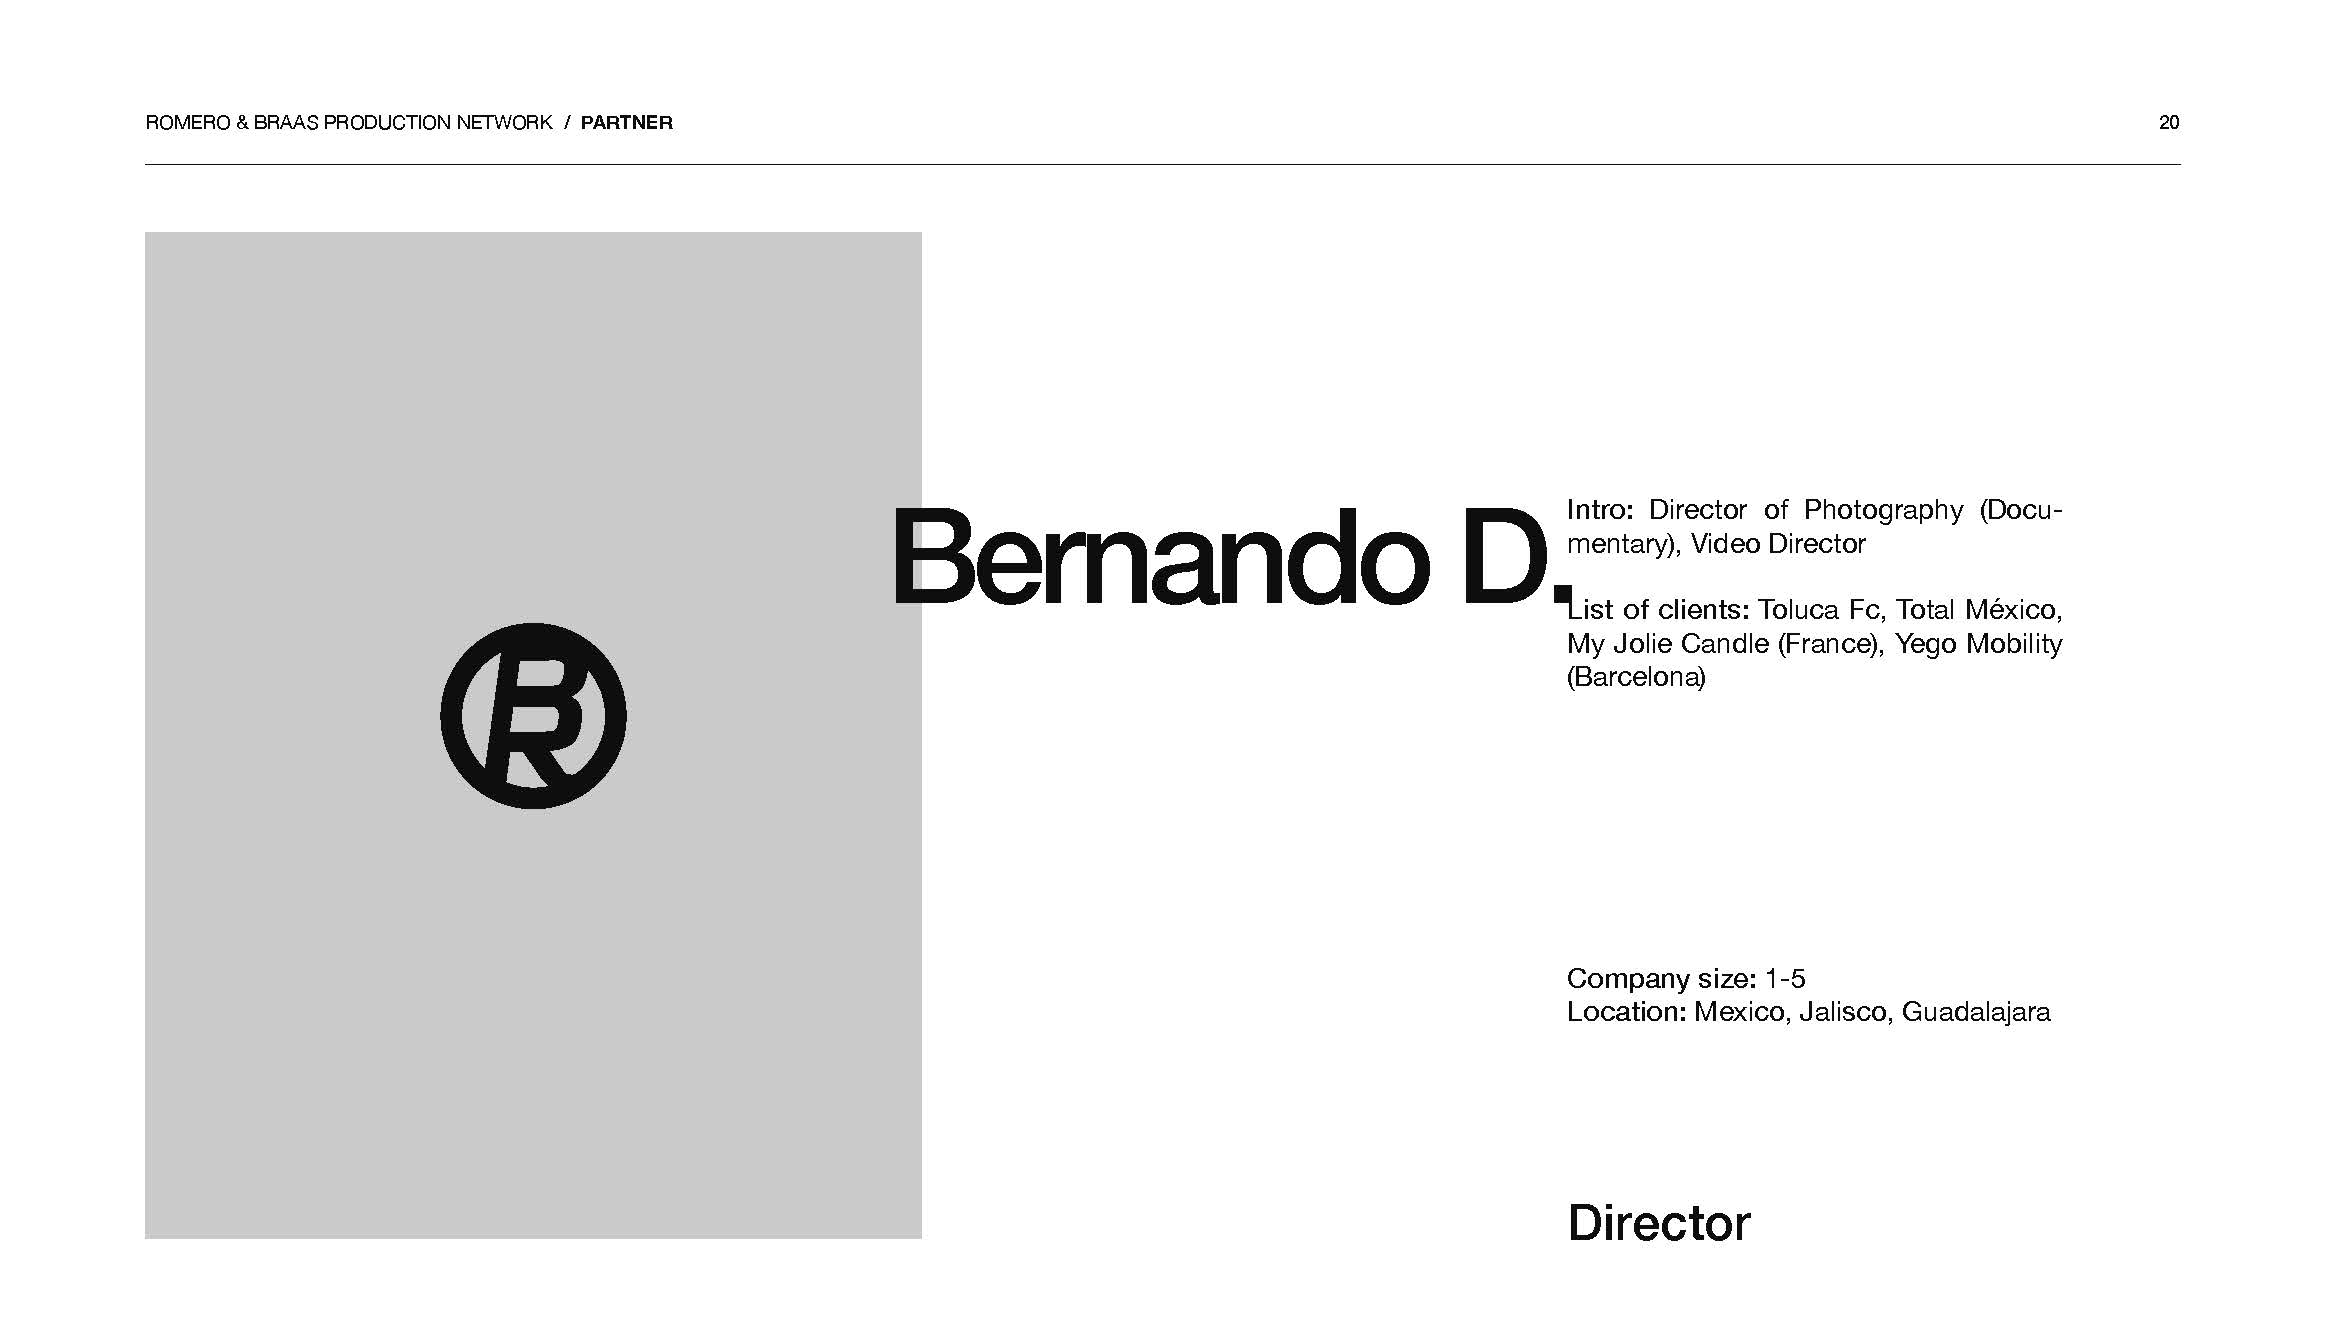 Production_Network_romeroandbraas_Seite_20.jpg